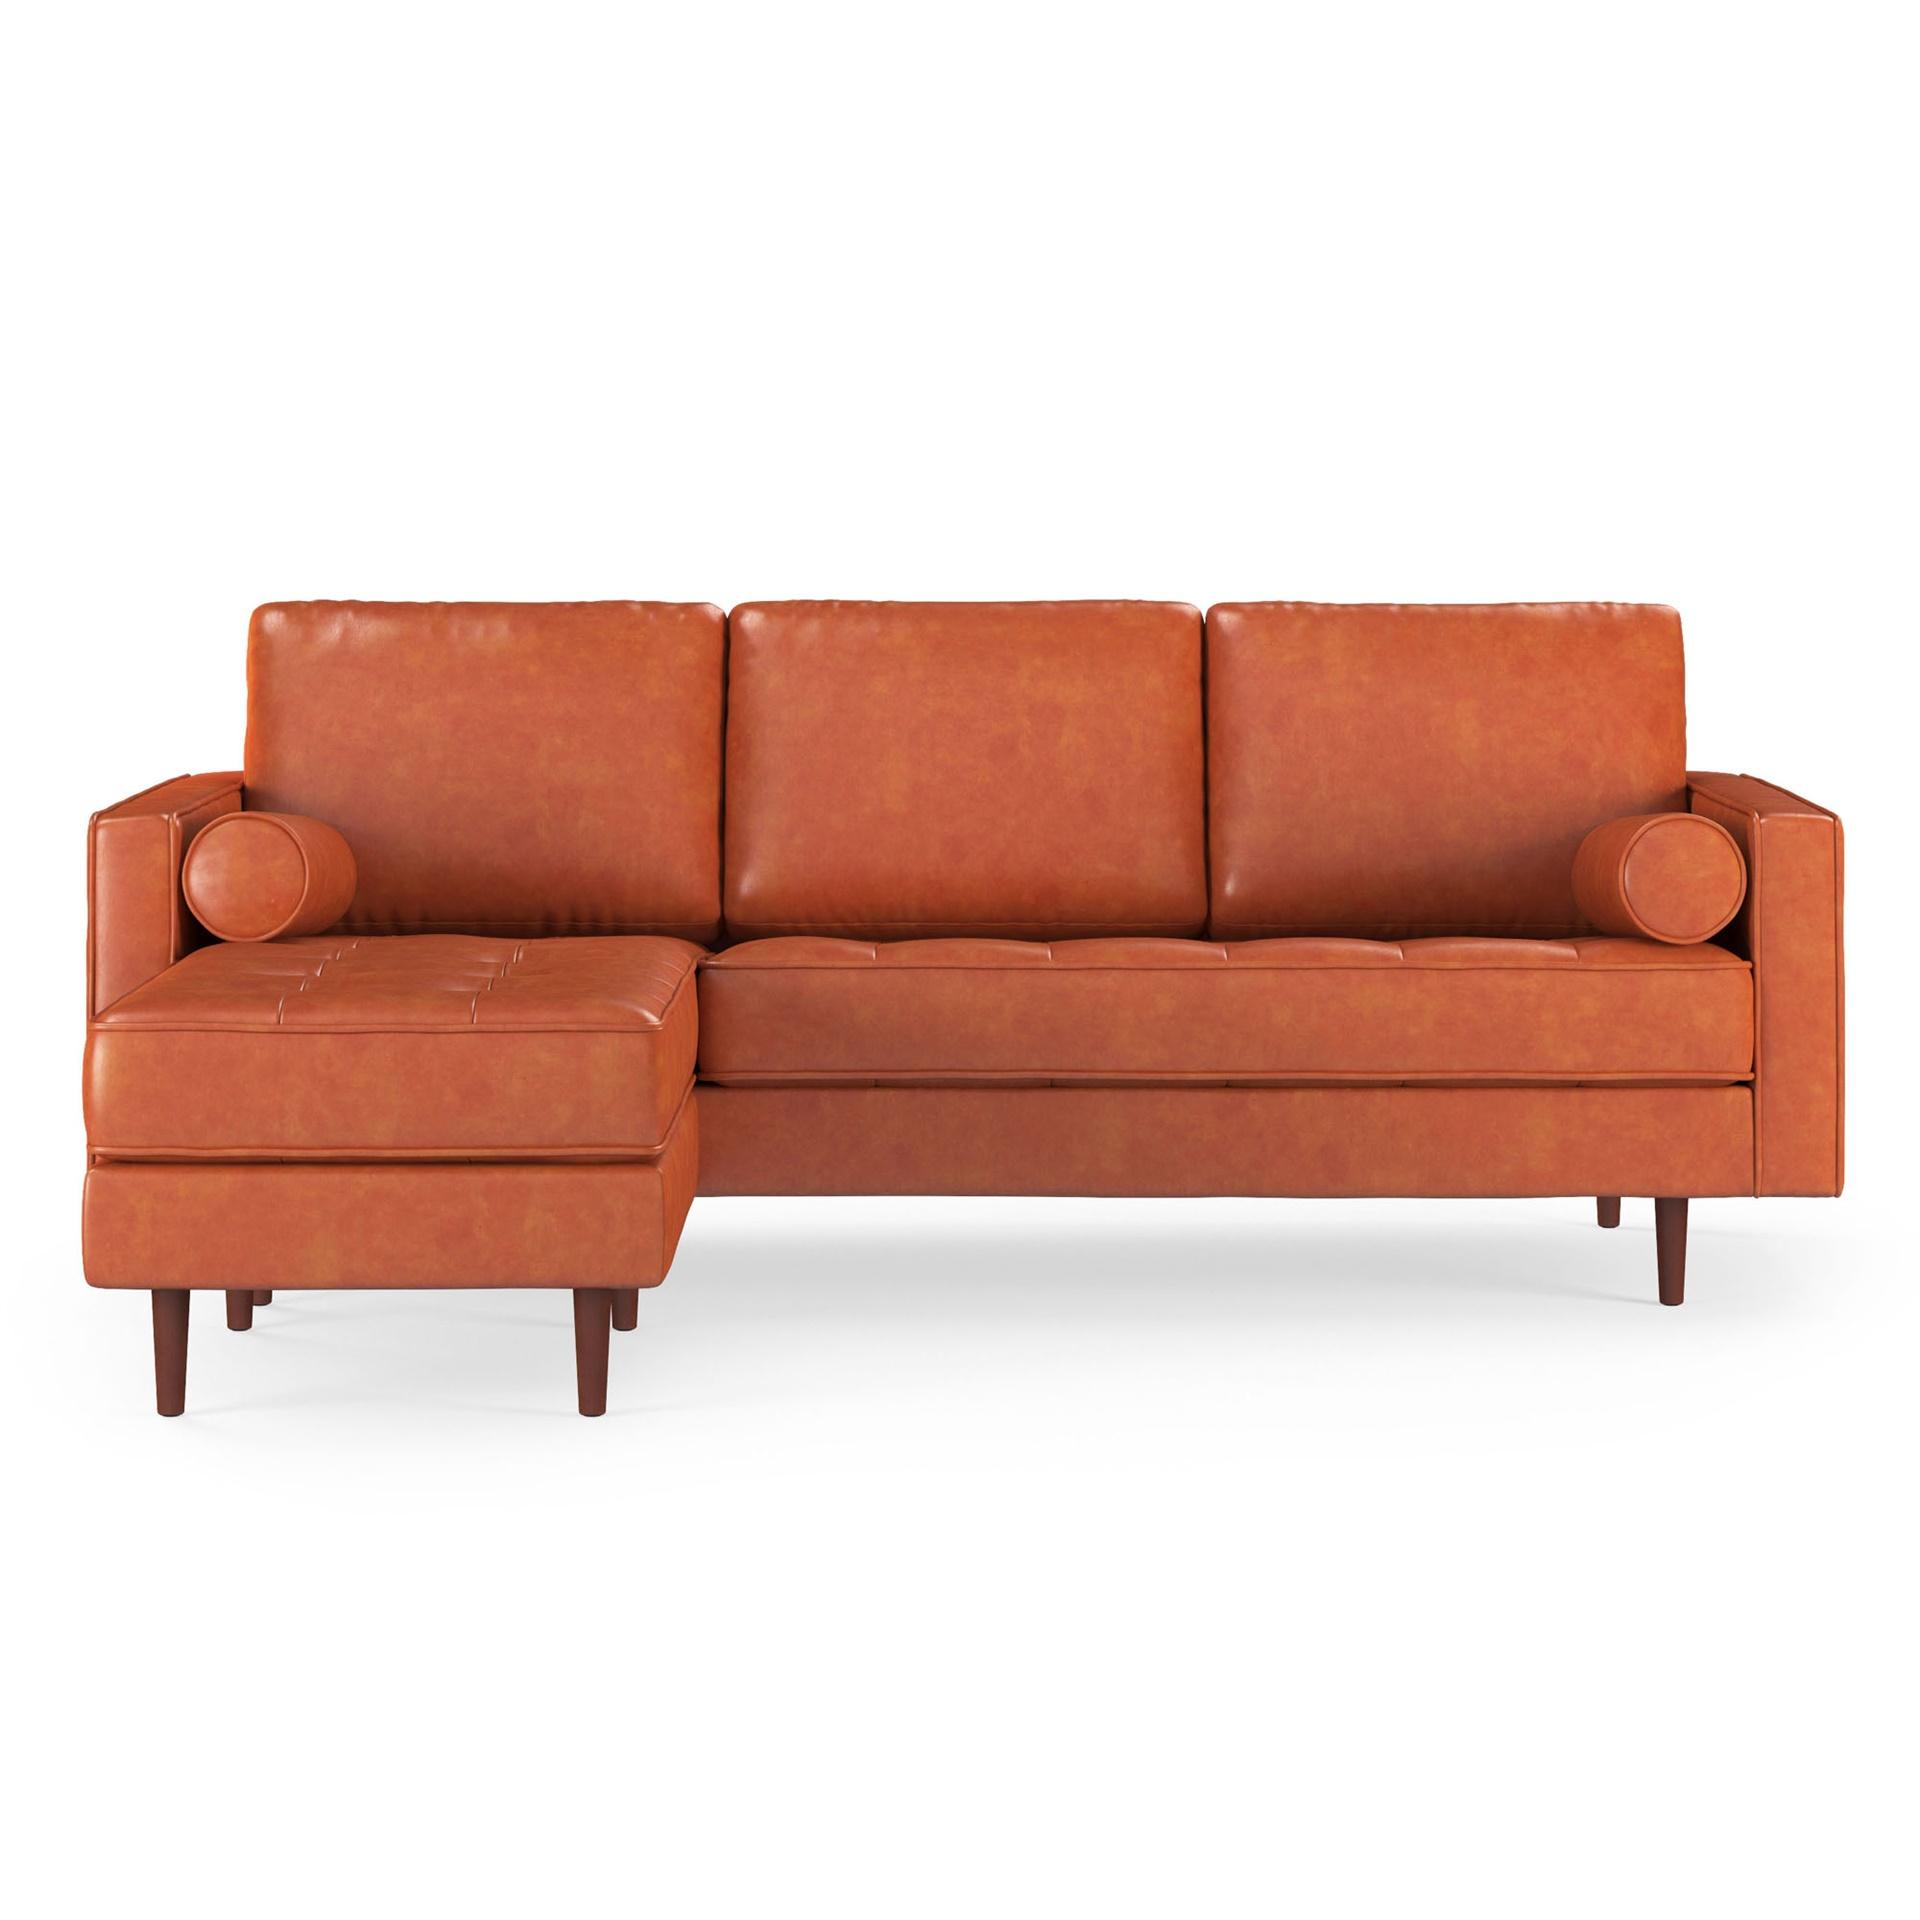 Sensational Ashton Reversible Vintage Leather Sectional Download Free Architecture Designs Scobabritishbridgeorg